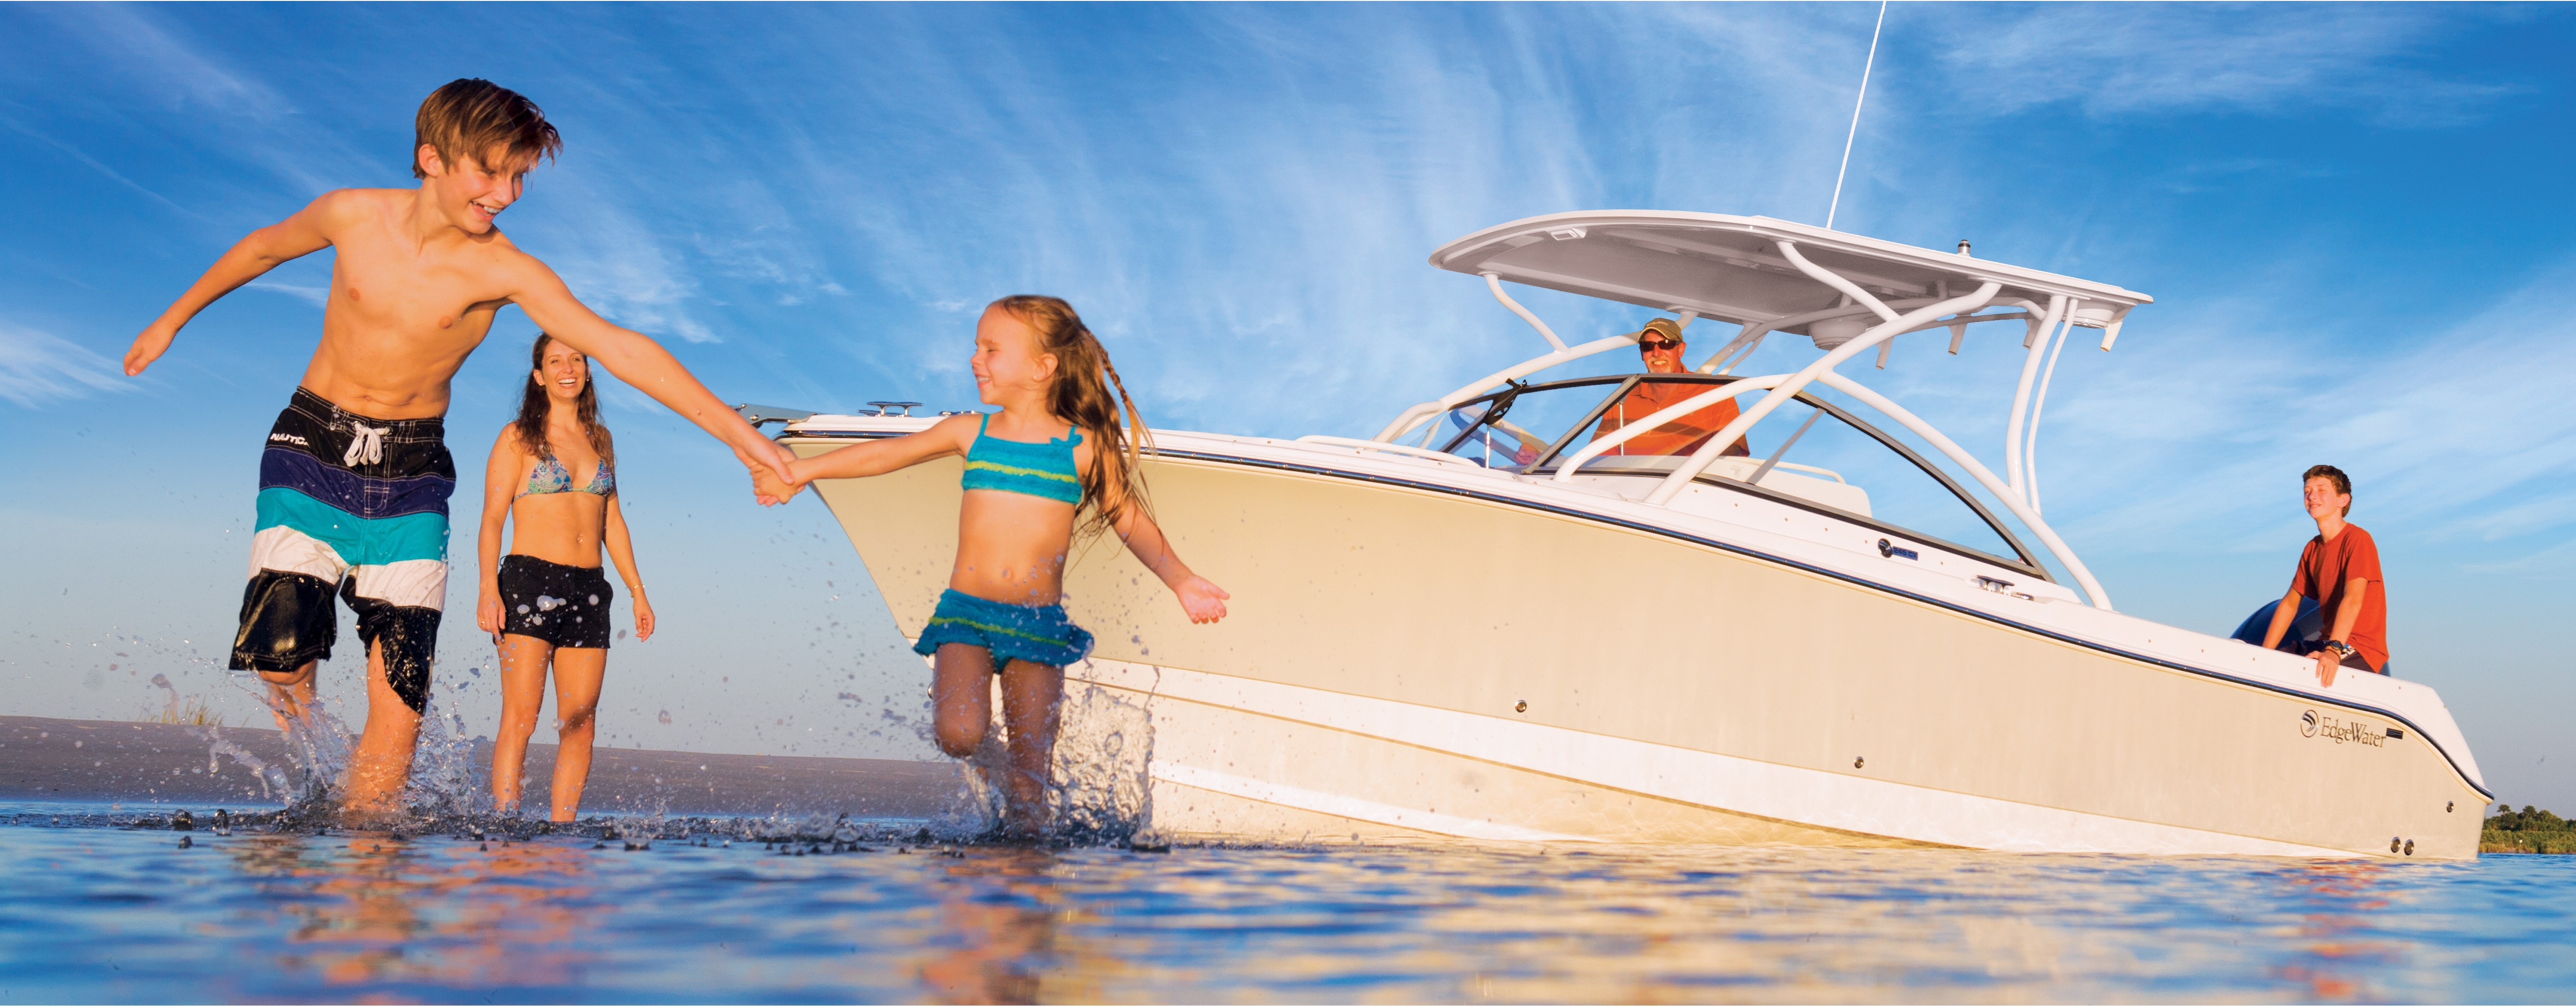 Buy Edgewater Boat